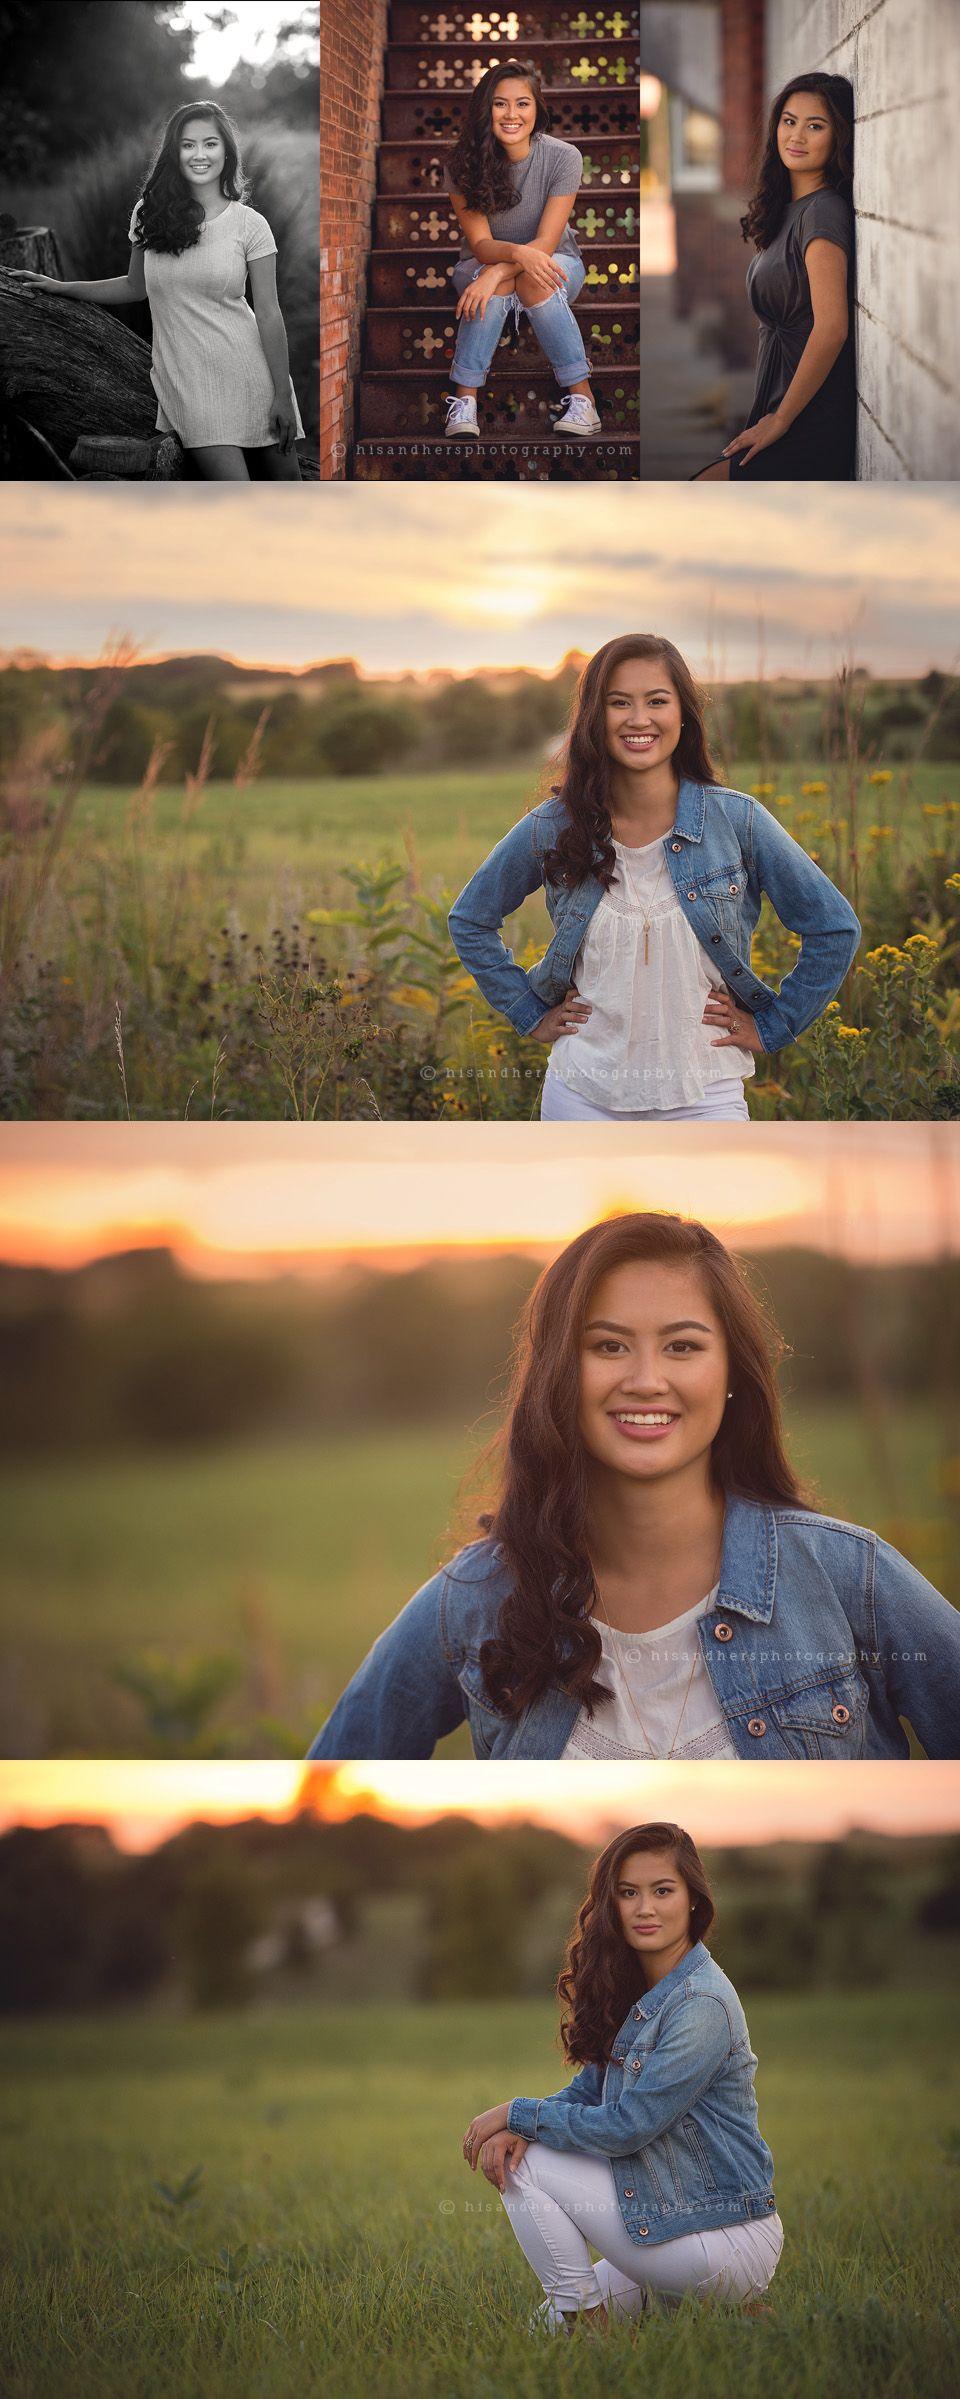 Senior | Heather, class of 2017